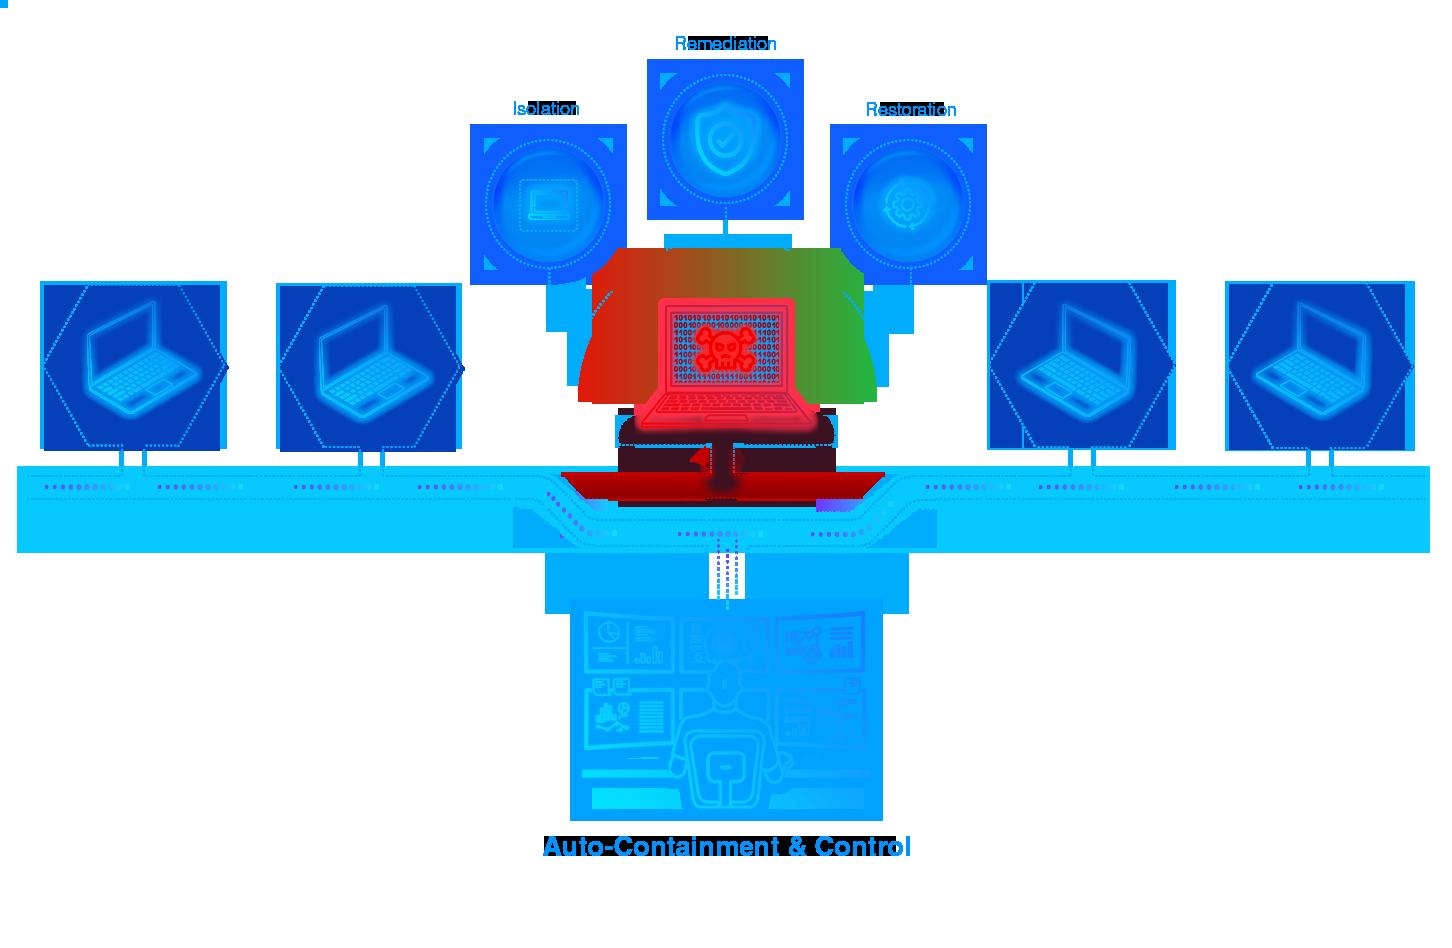 Auto Containment diagram